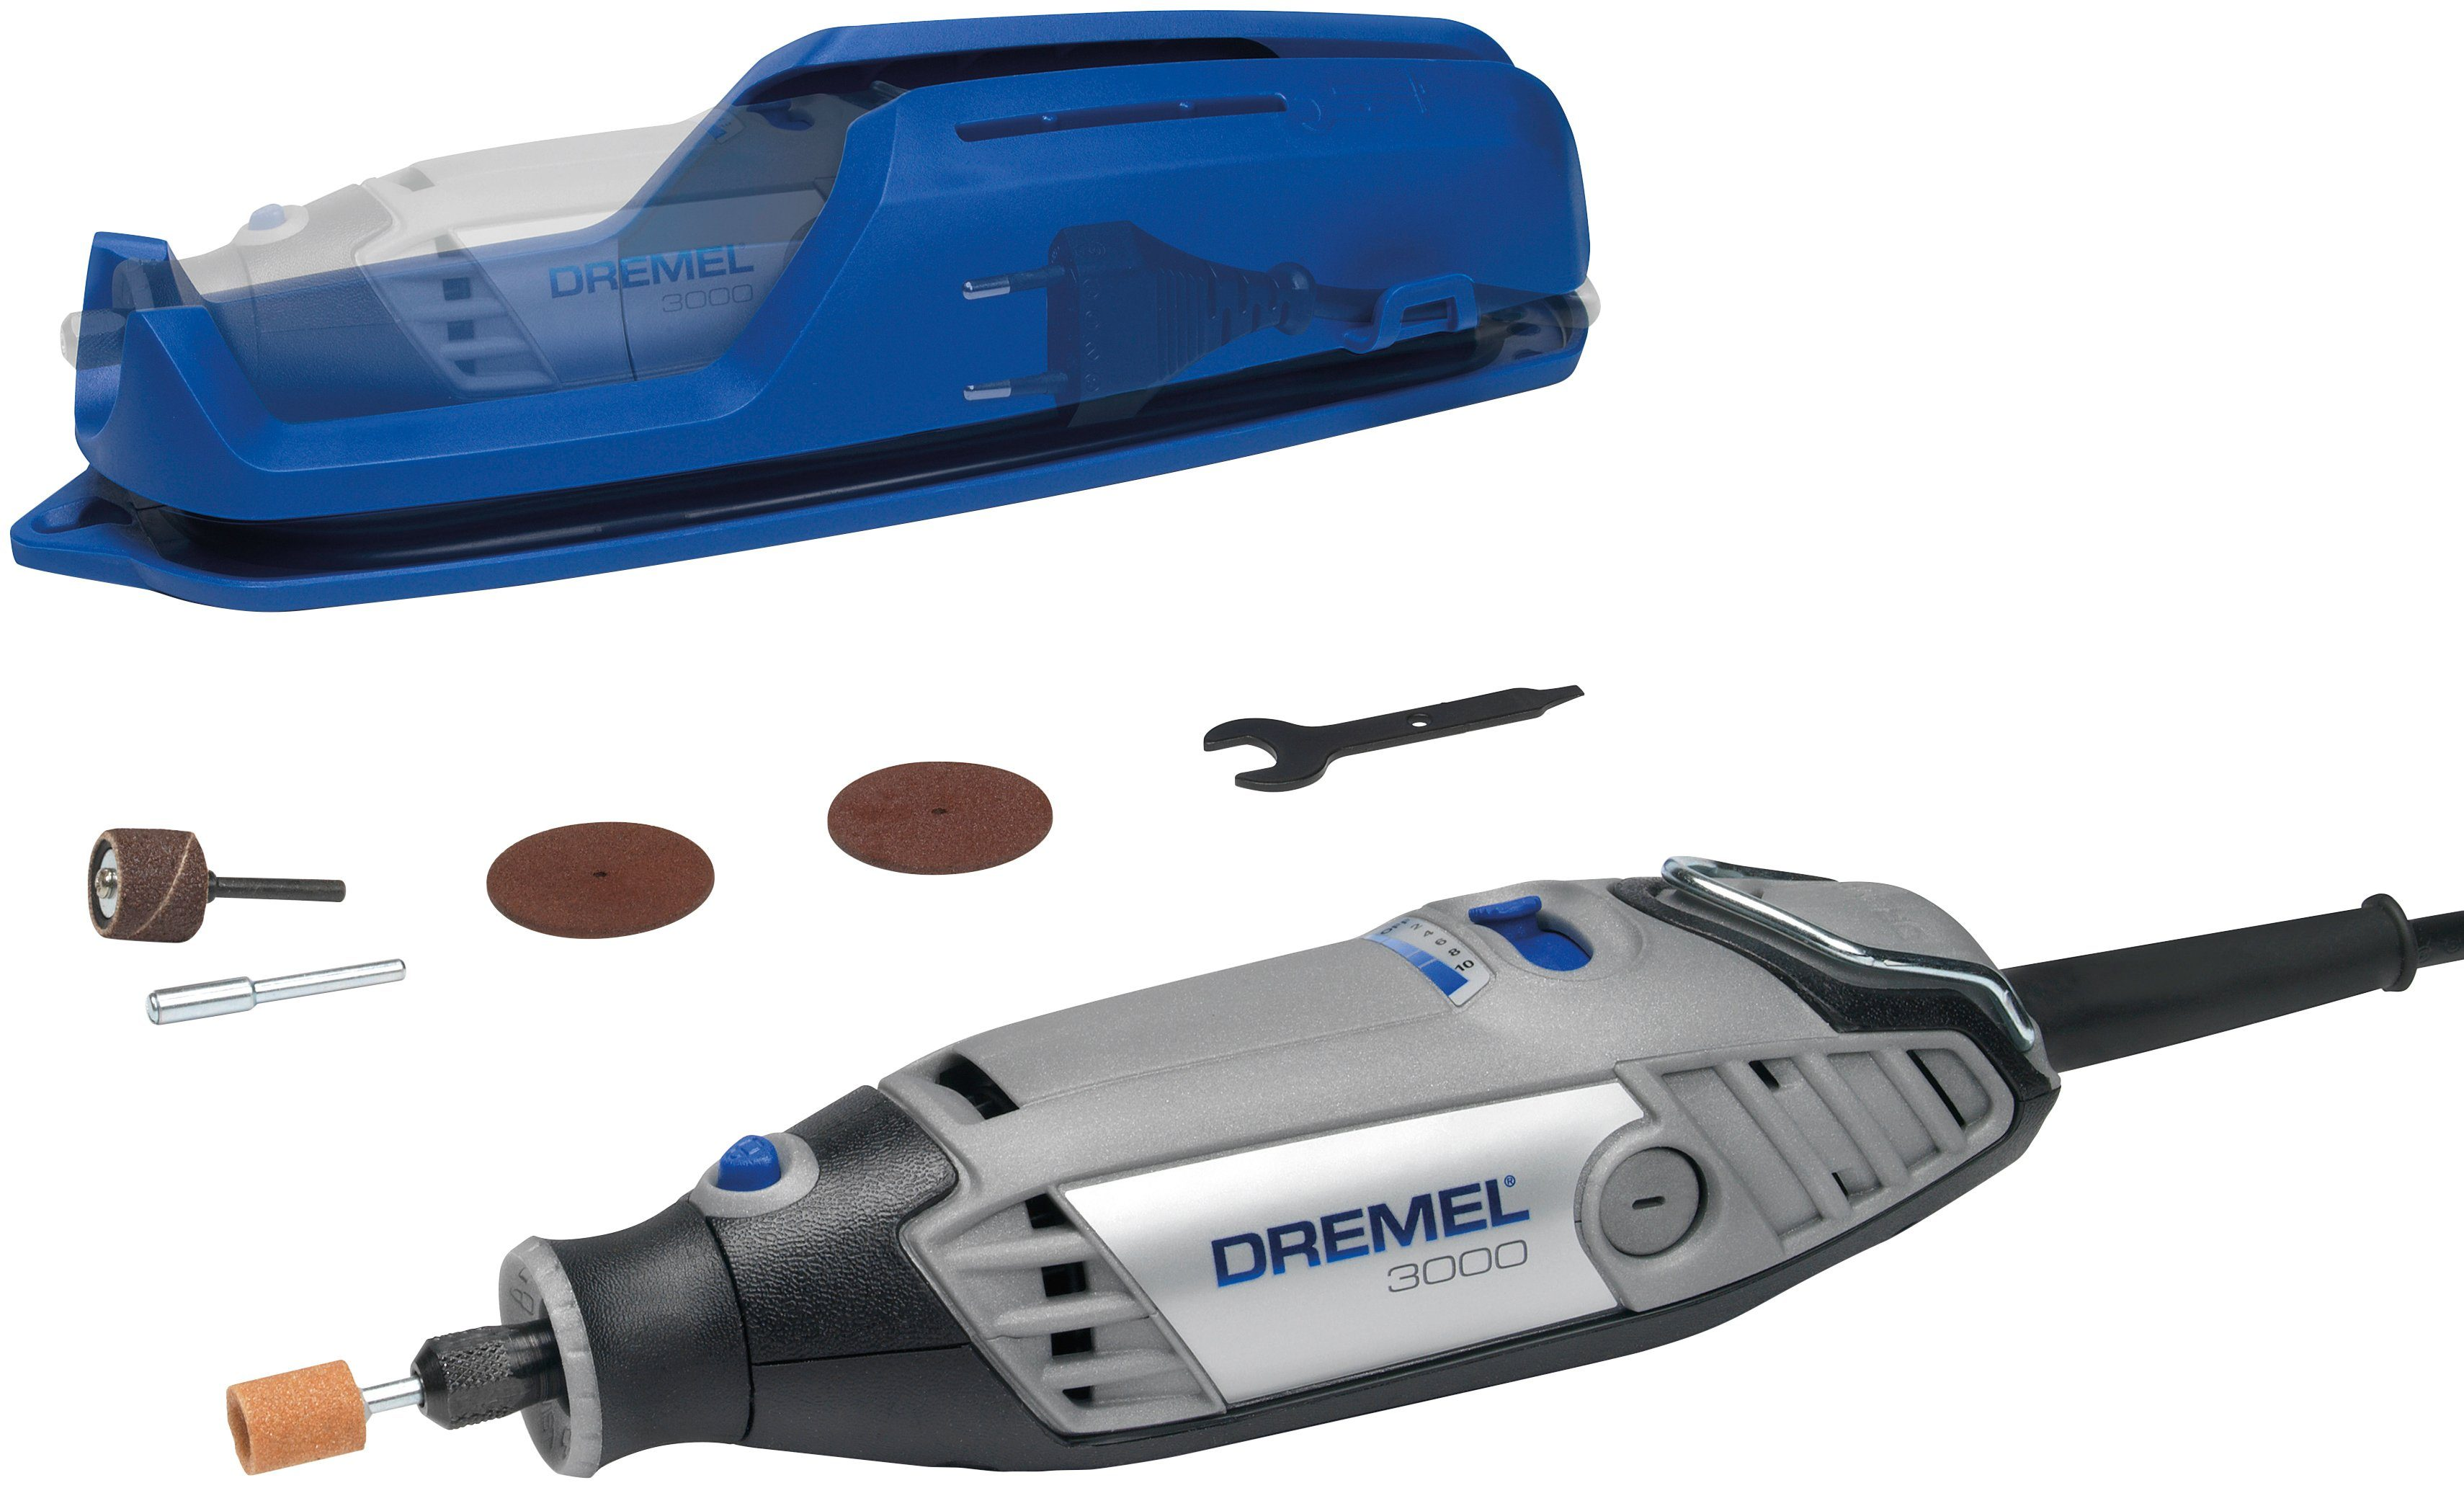 DREMEL Multifunktionswerkzeug »Dremel 3000-1/5«, 3-Diamanten-Set